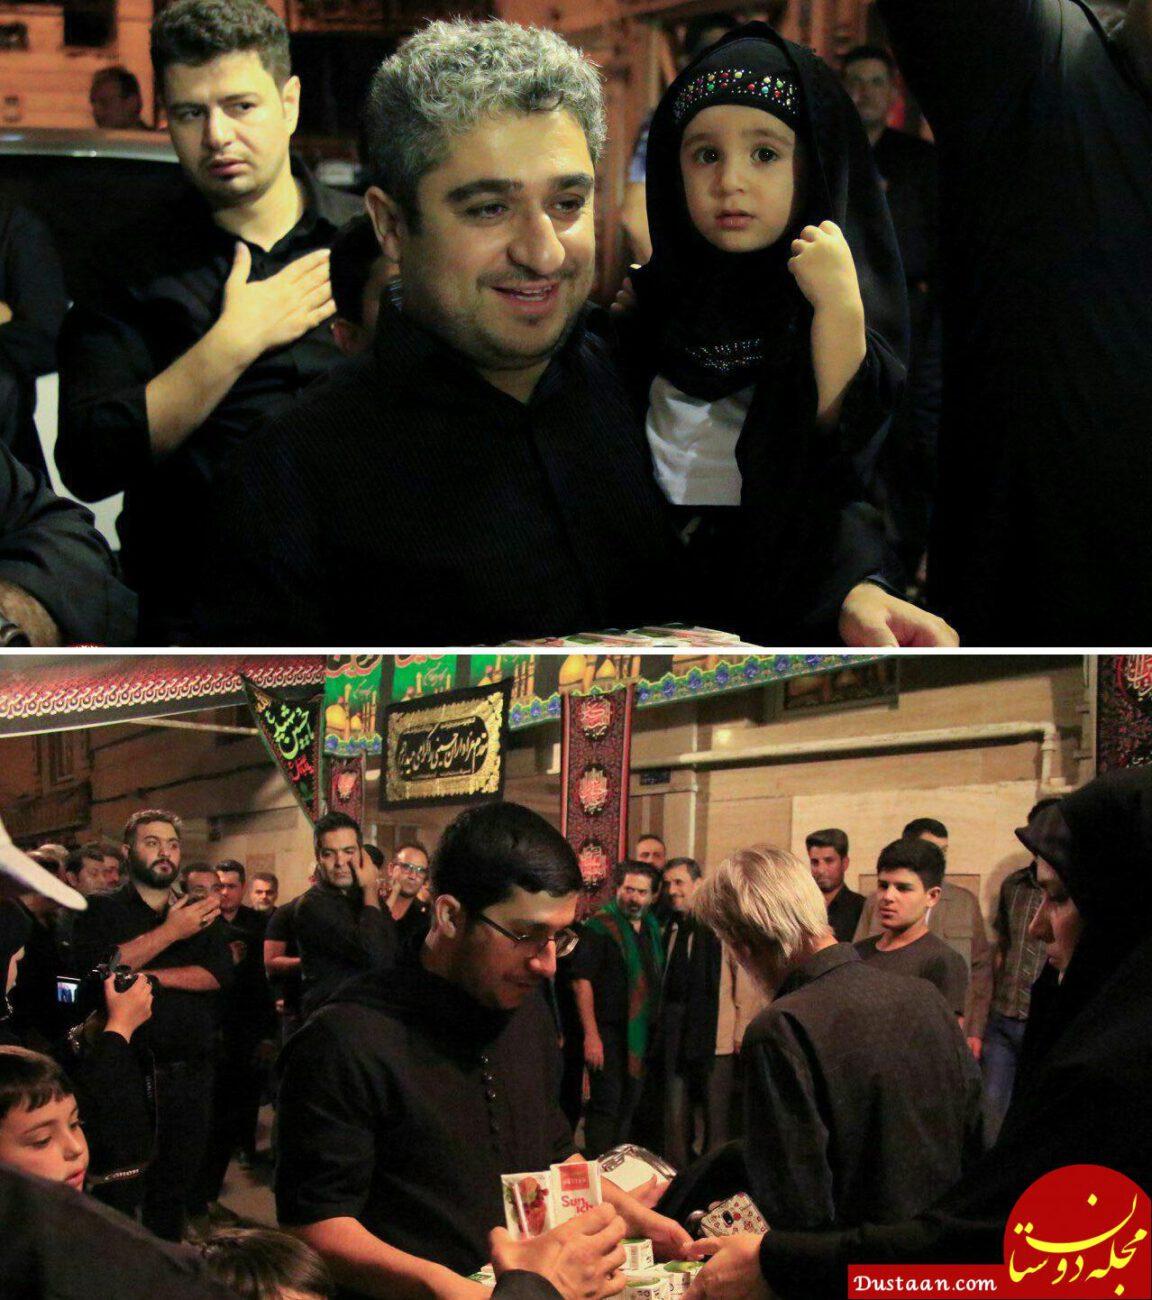 www.dustaan.com پسران احمدی نژاد در حال پخش نذری +عکس